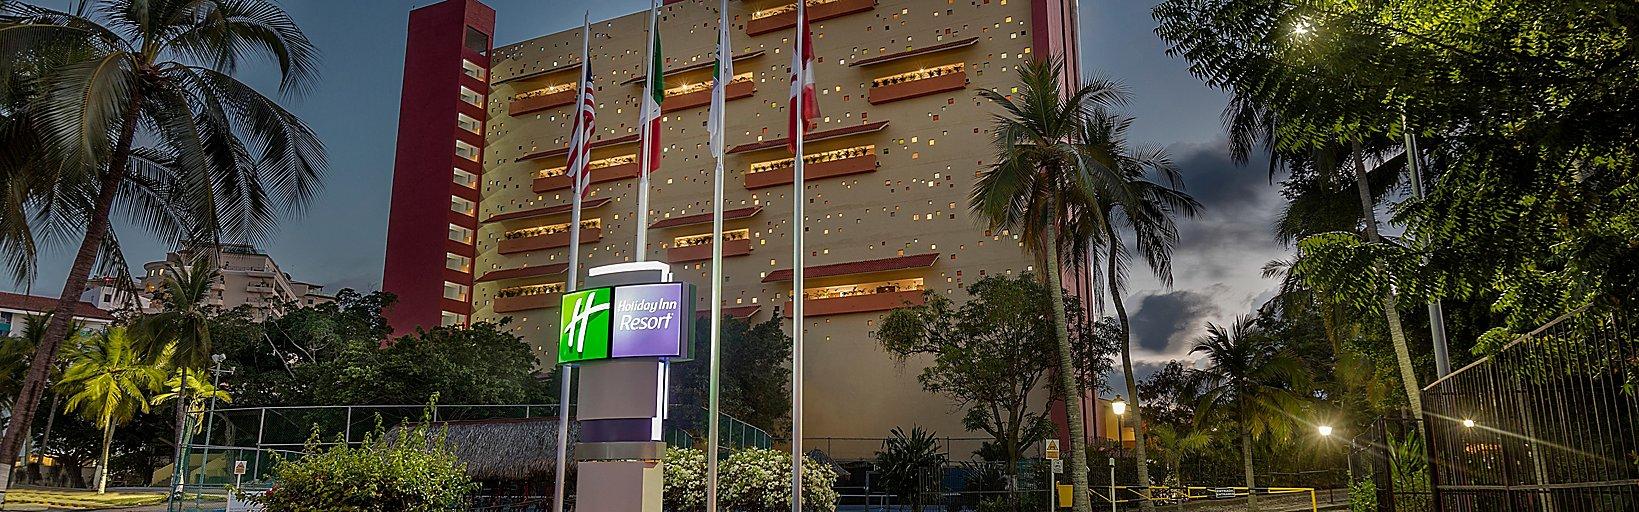 Holiday Inn Resort Ixtapa All-Inclusive Hotel by IHG on zihuatanejo beach hotels, azul all inclusive, zihuatanejo restaurants, south carolina vacations all inclusive, zihuatanejo mexico,